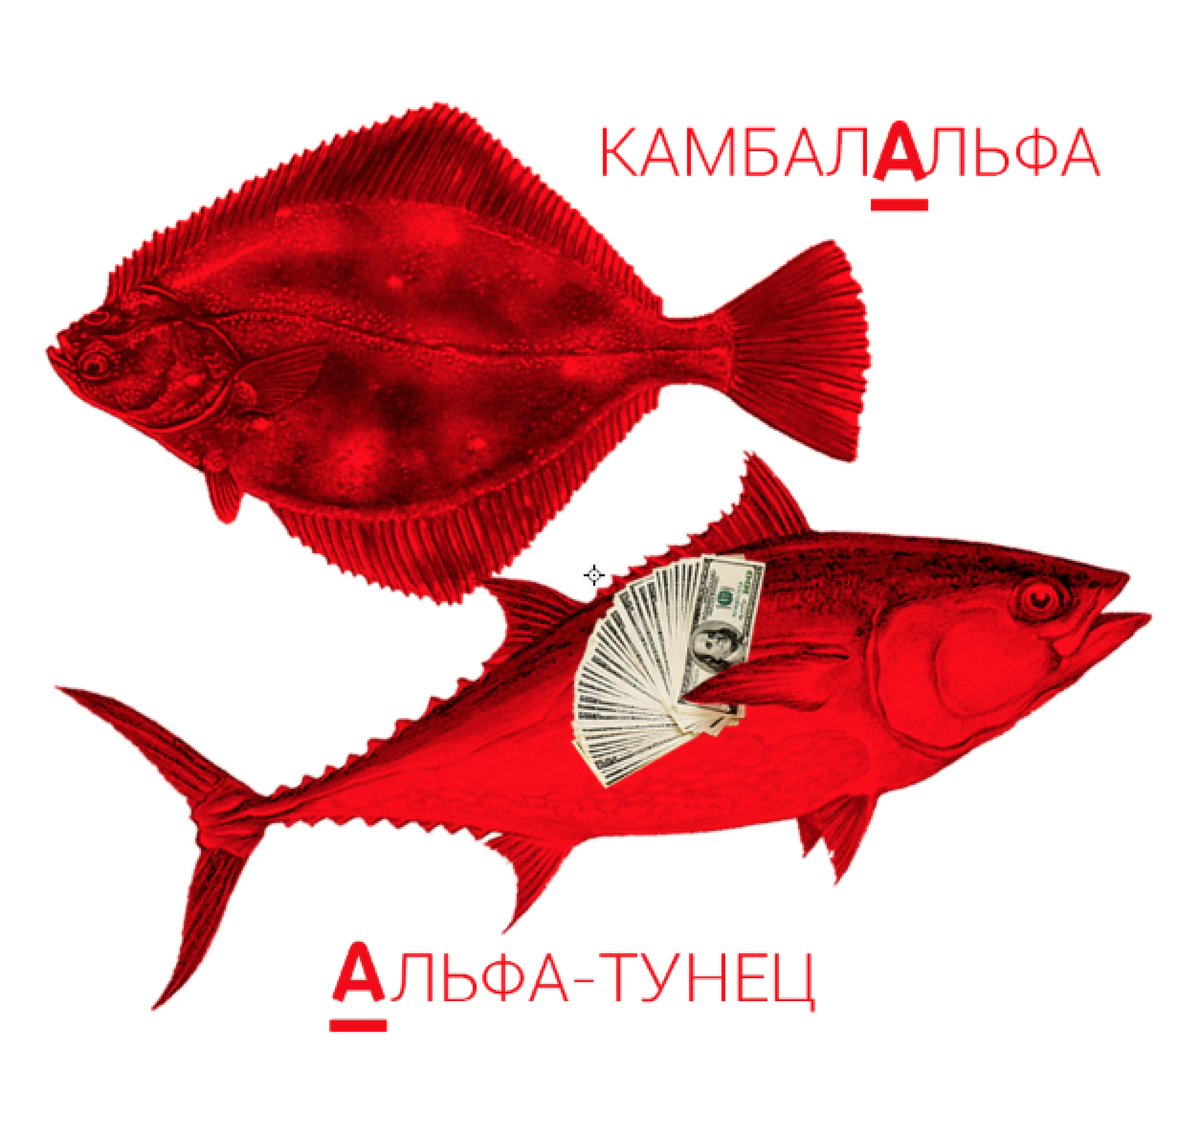 @Beeline_RUS @GoogleRussia @aviasales Наши рыбы к вам доплыли! Что у вас, @Mastercard_Ru? Мастеркарп не предлагать! https://t.co/zpy6figeTn